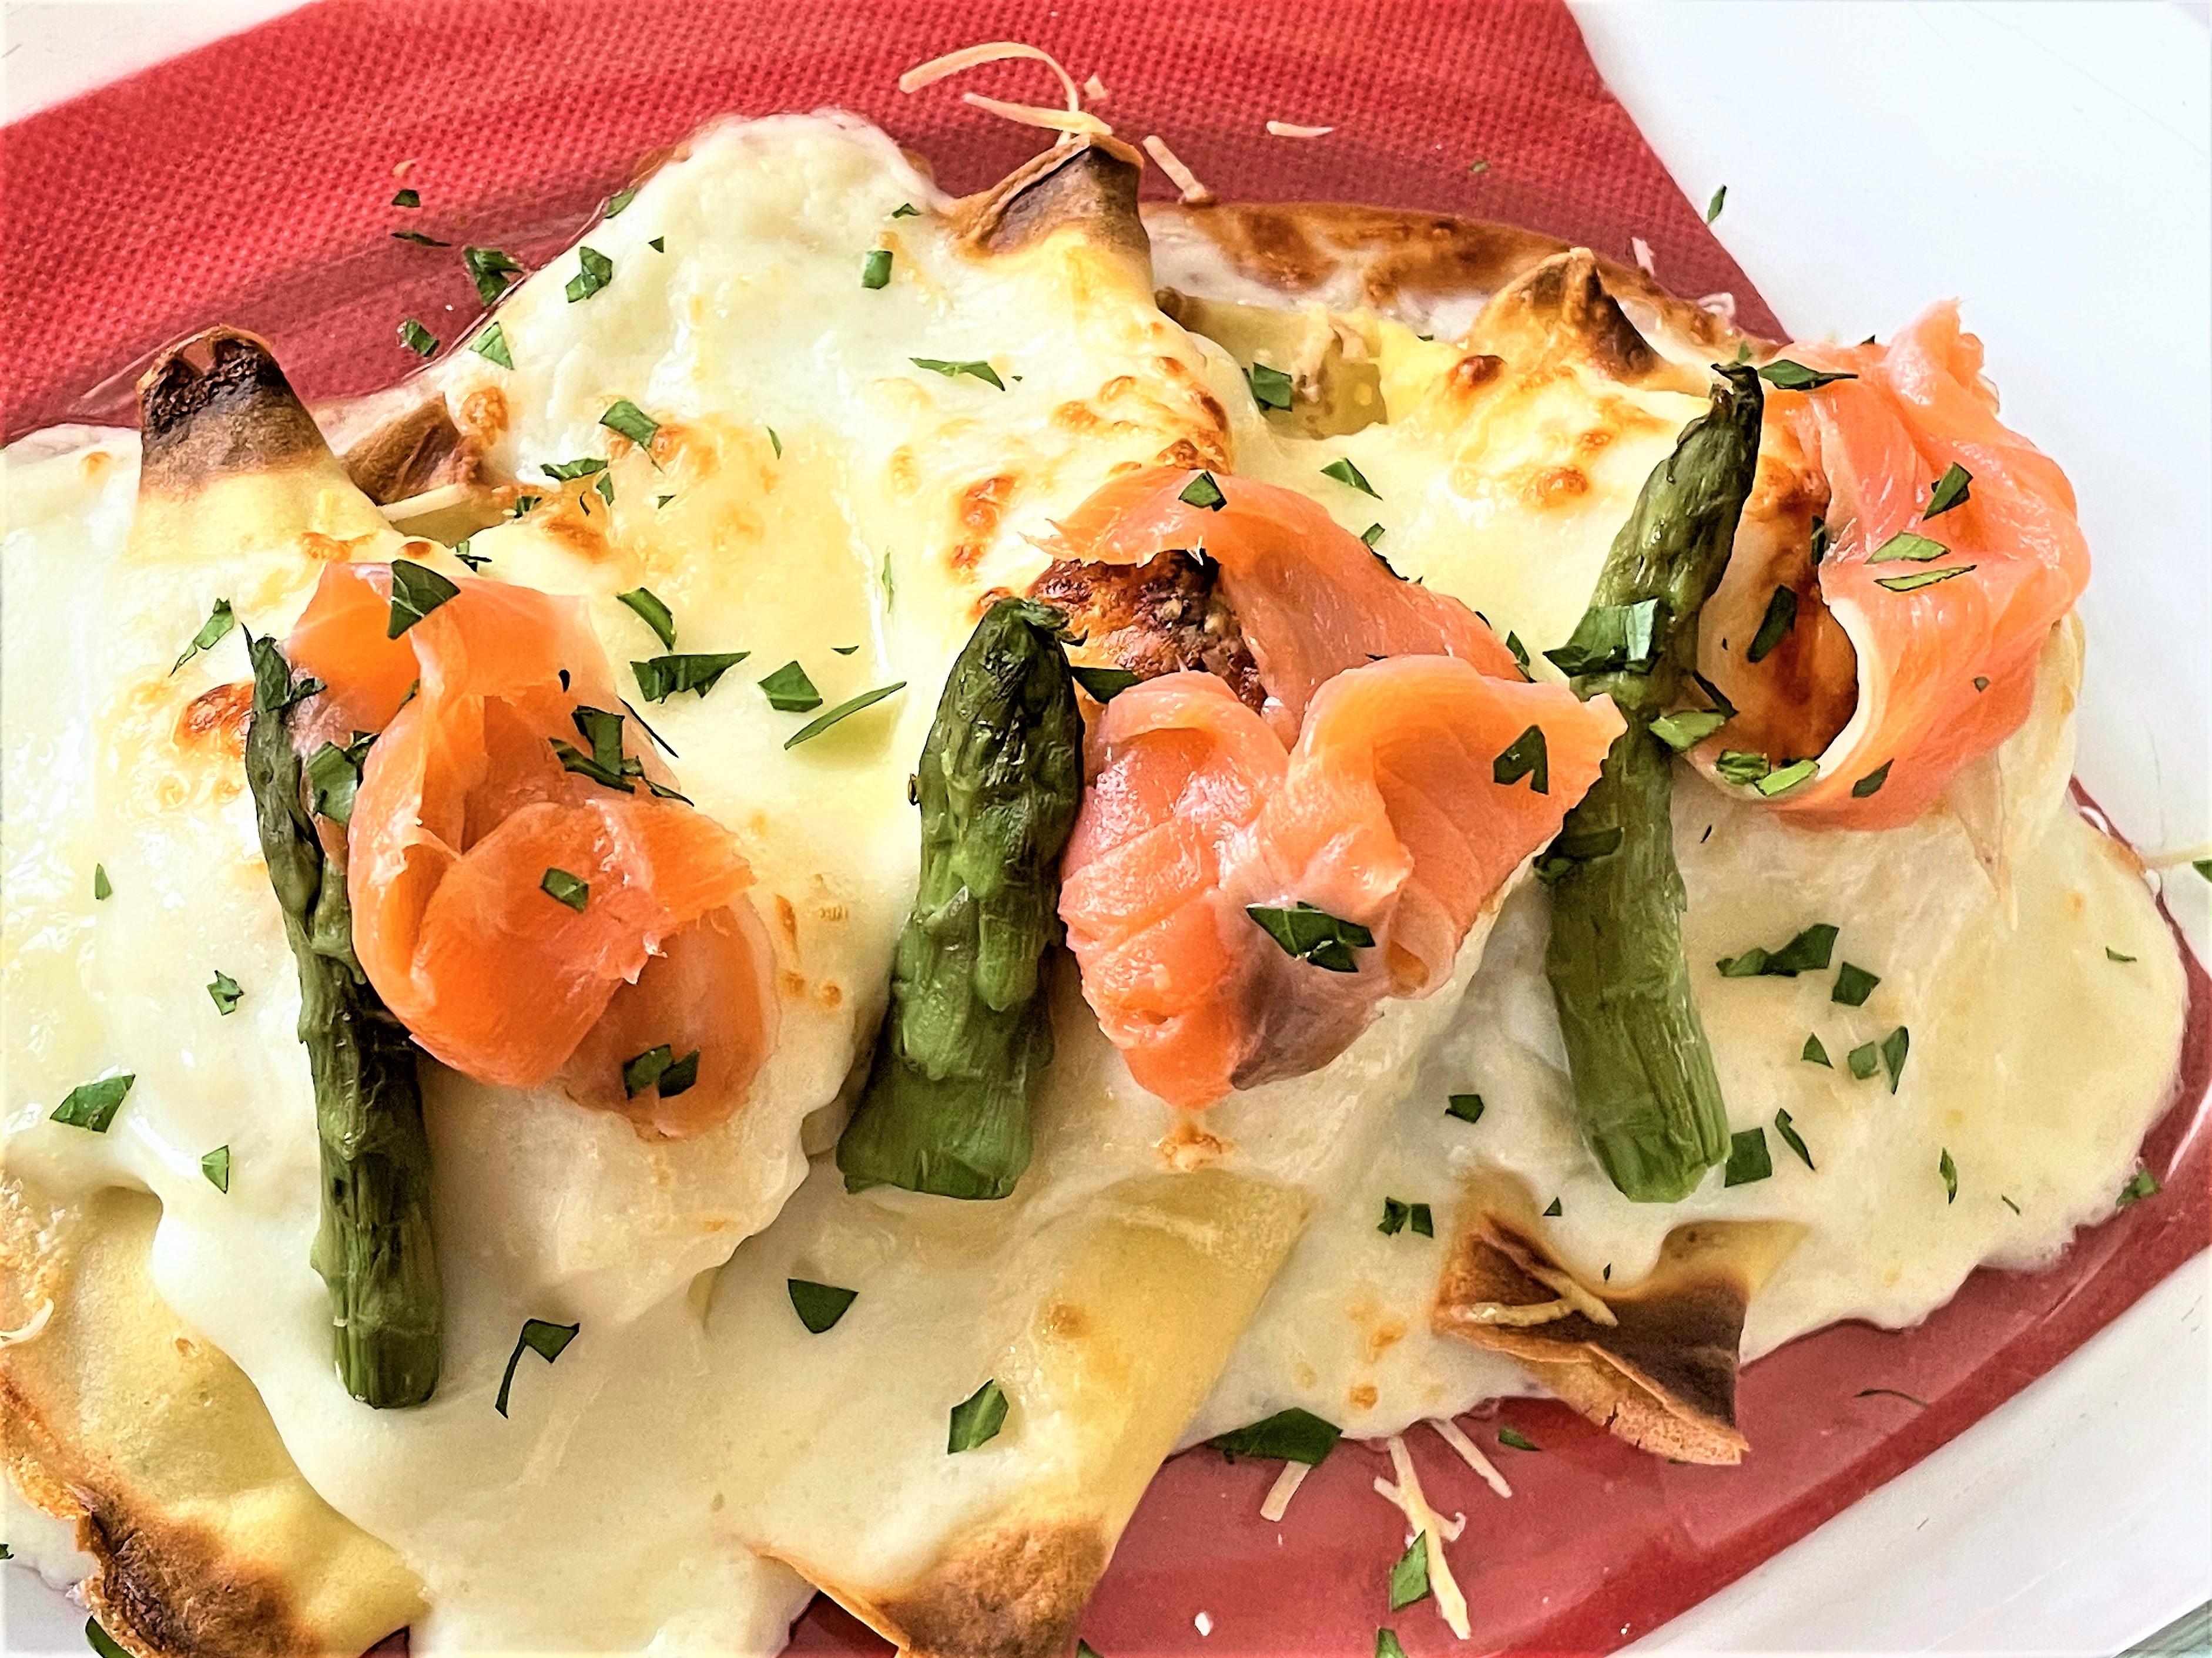 Crespelle con salmone affumicato e asparagi